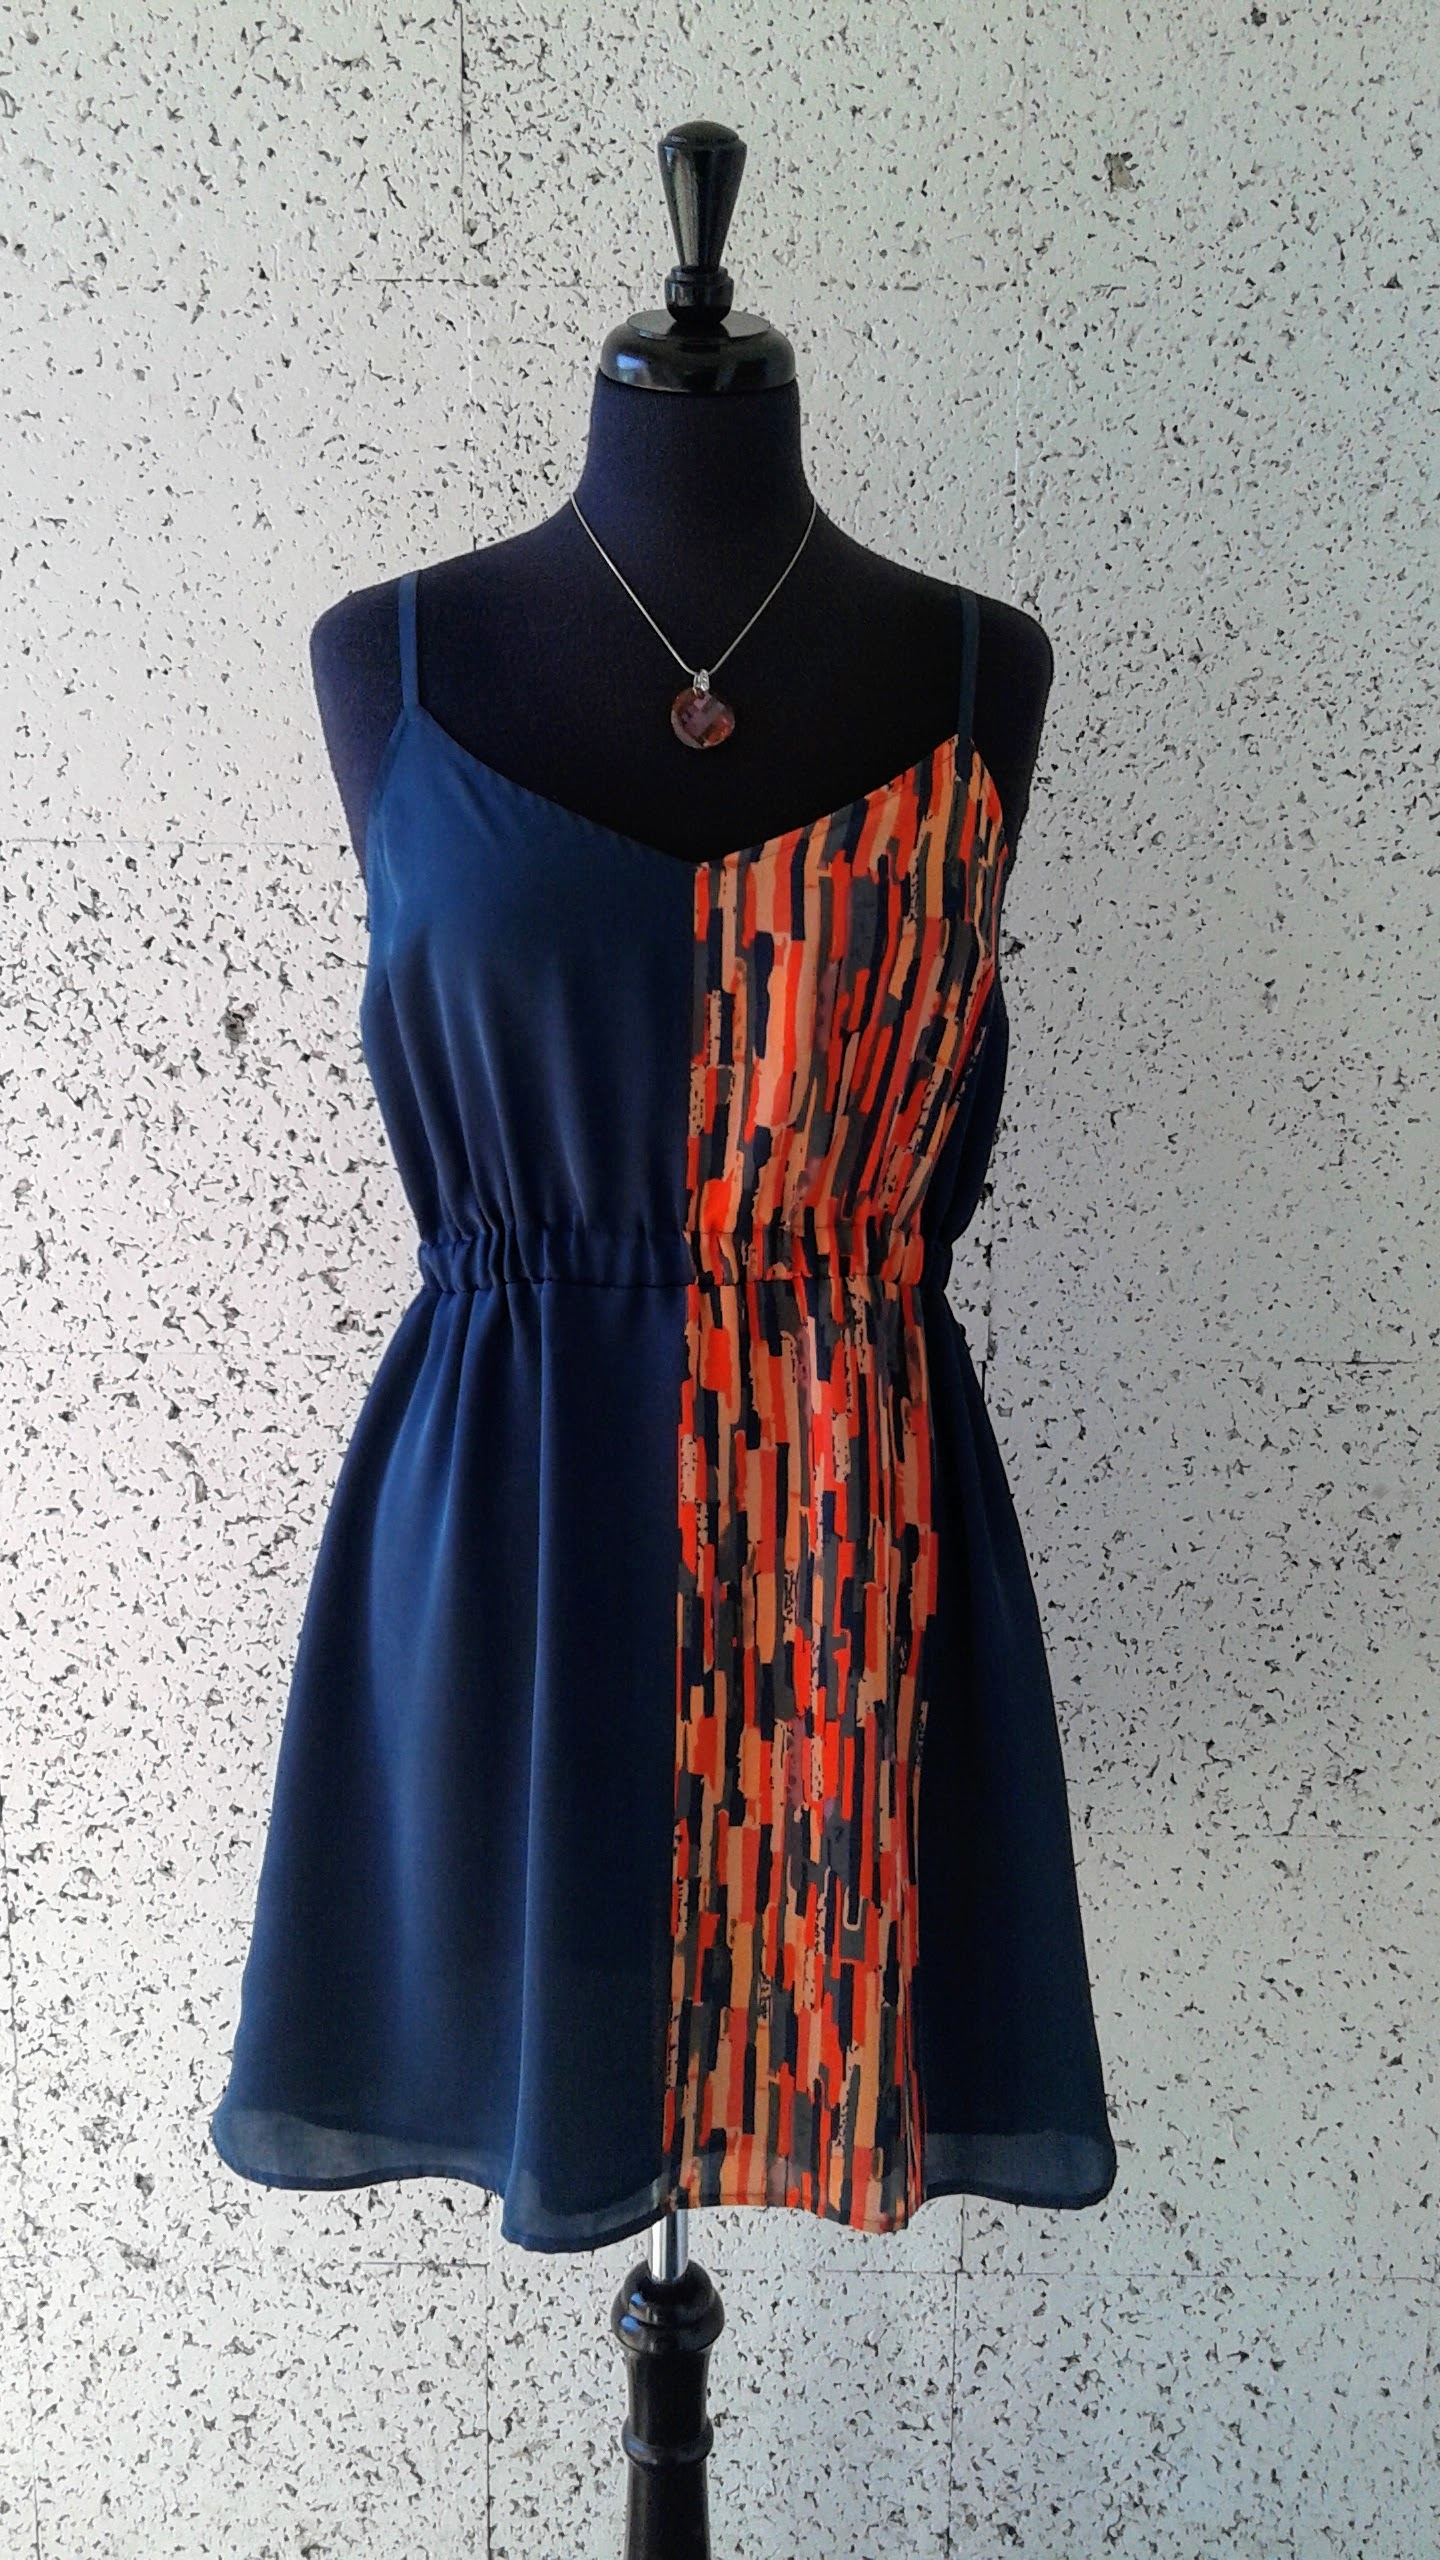 Lauren Conrad dress; Size 10, $28